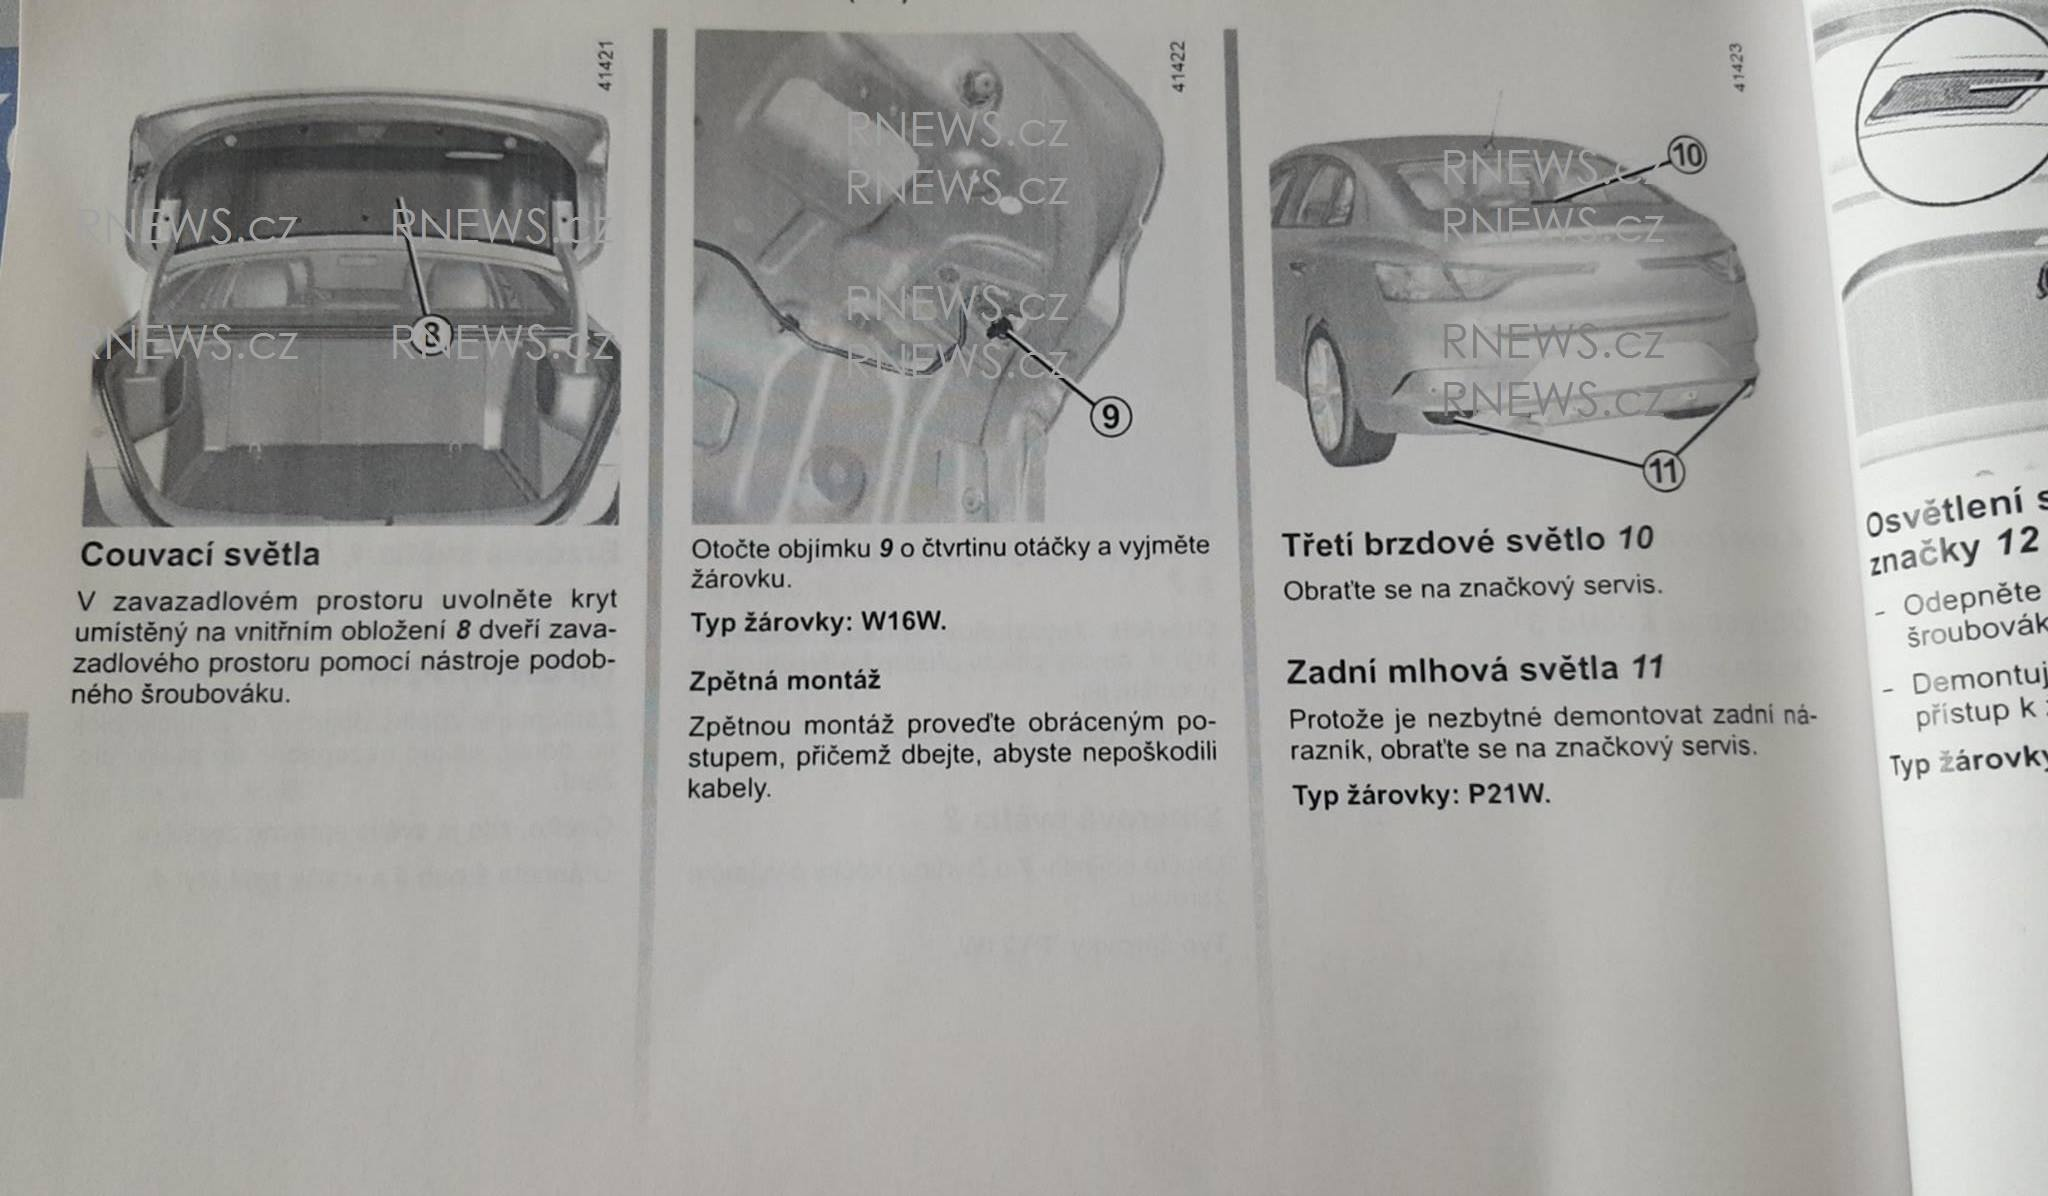 2017 Renault Megane Sedan Leaked Through Owner's Manual ...